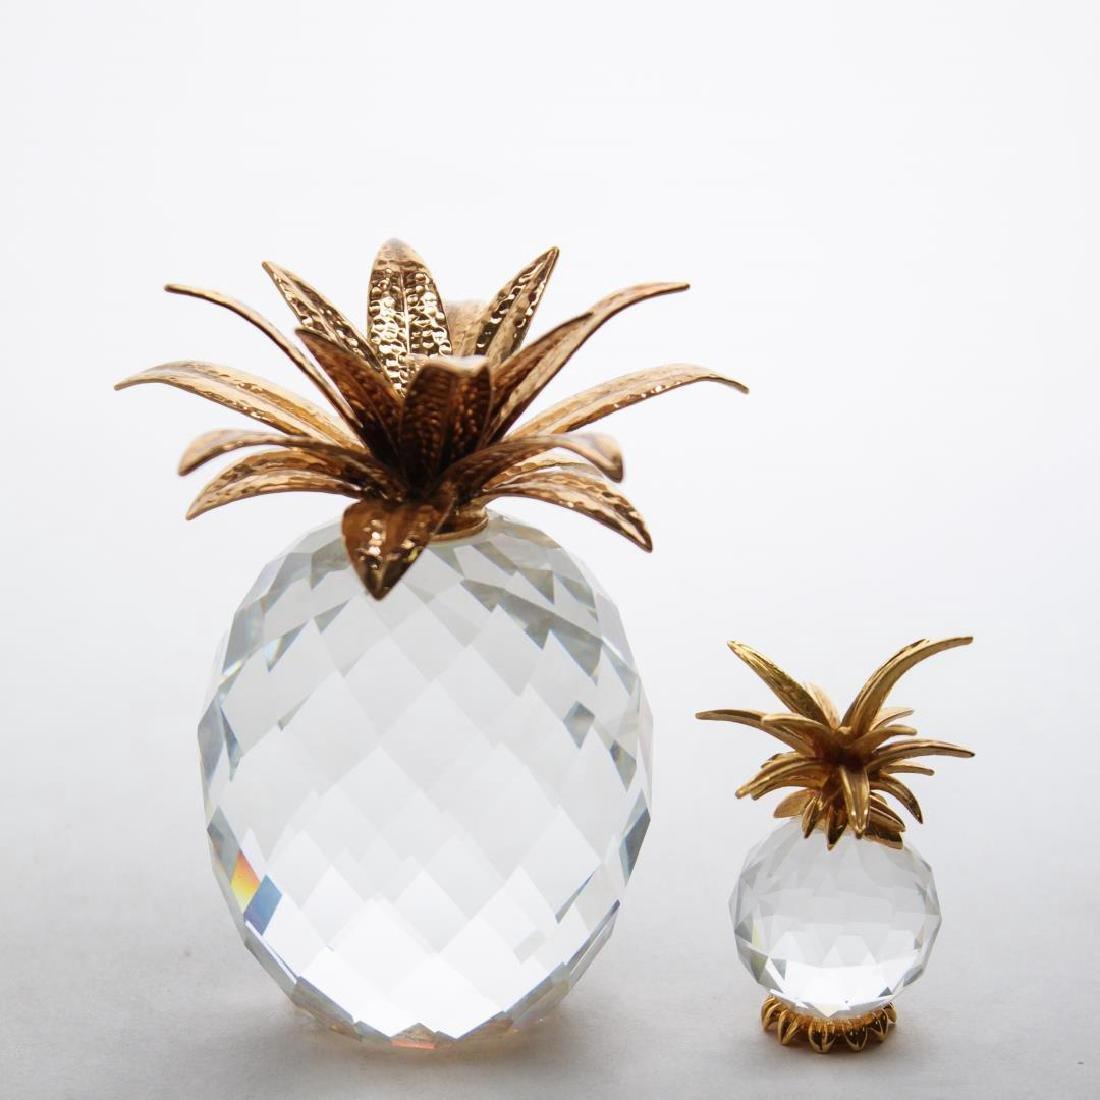 Swarovski Crystal Pineapple Paperweight & Ornament